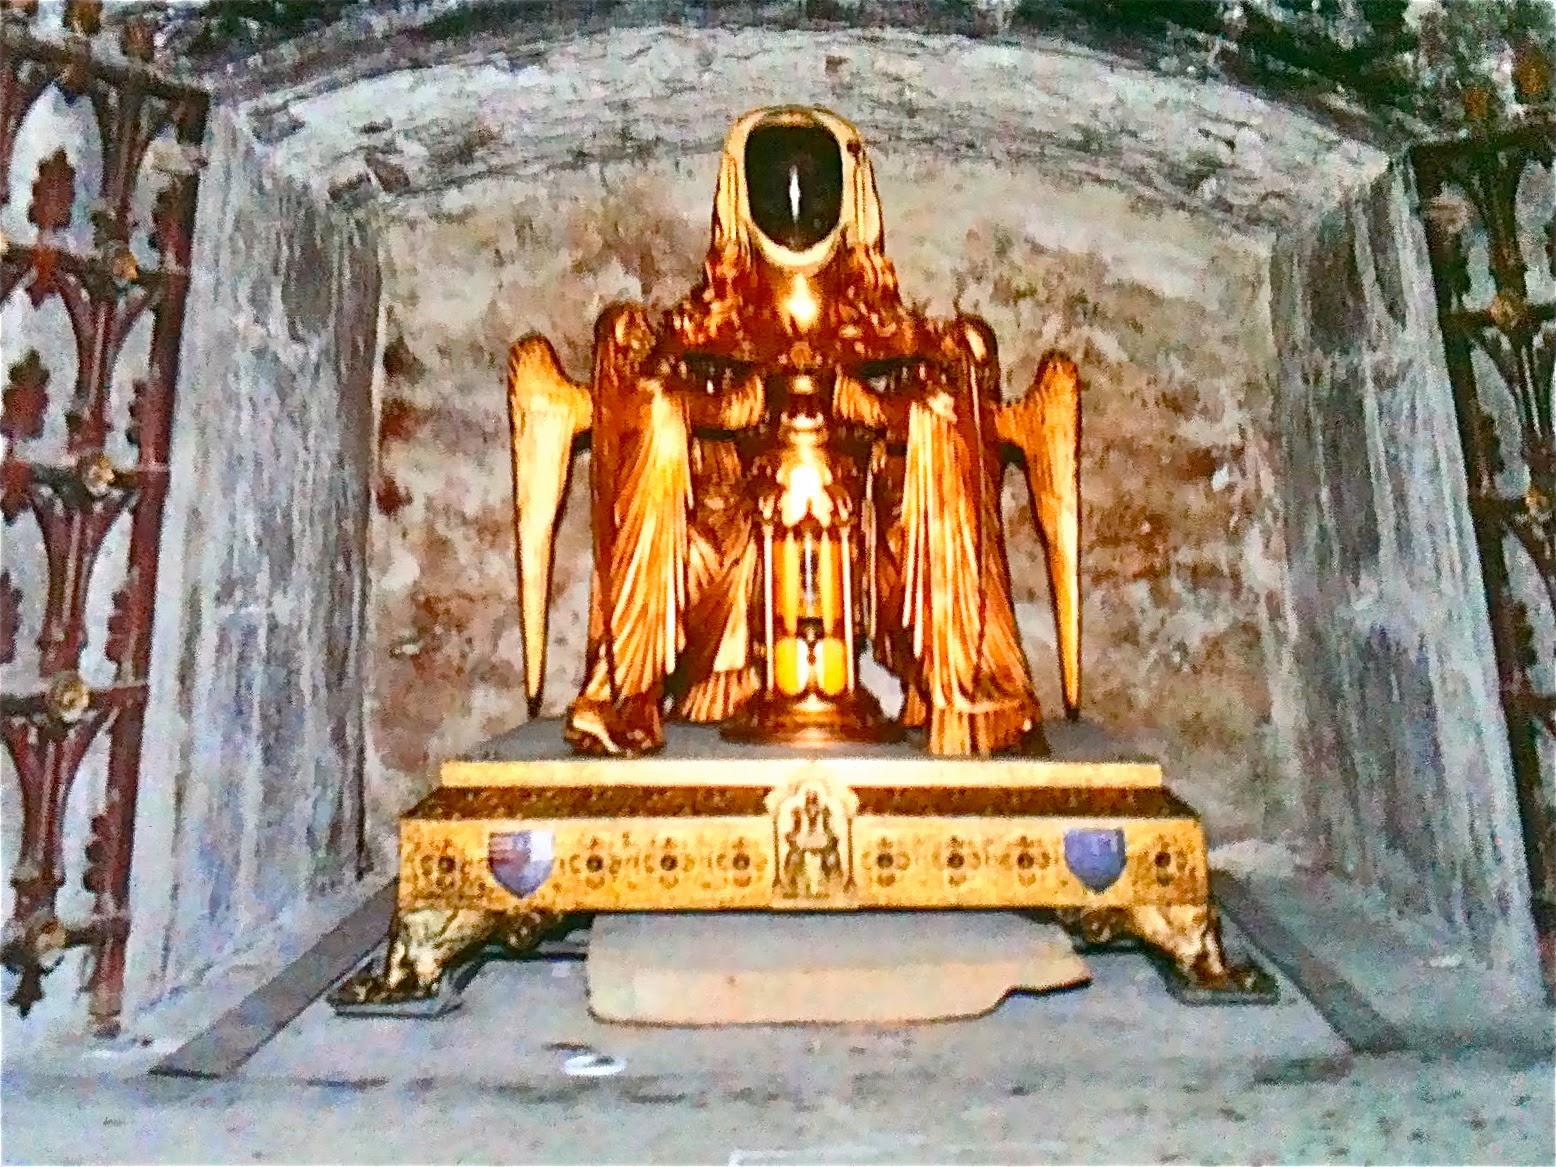 Saint maximin e la sainte baume santa maria maddalena for Garage santamaria saint maximin